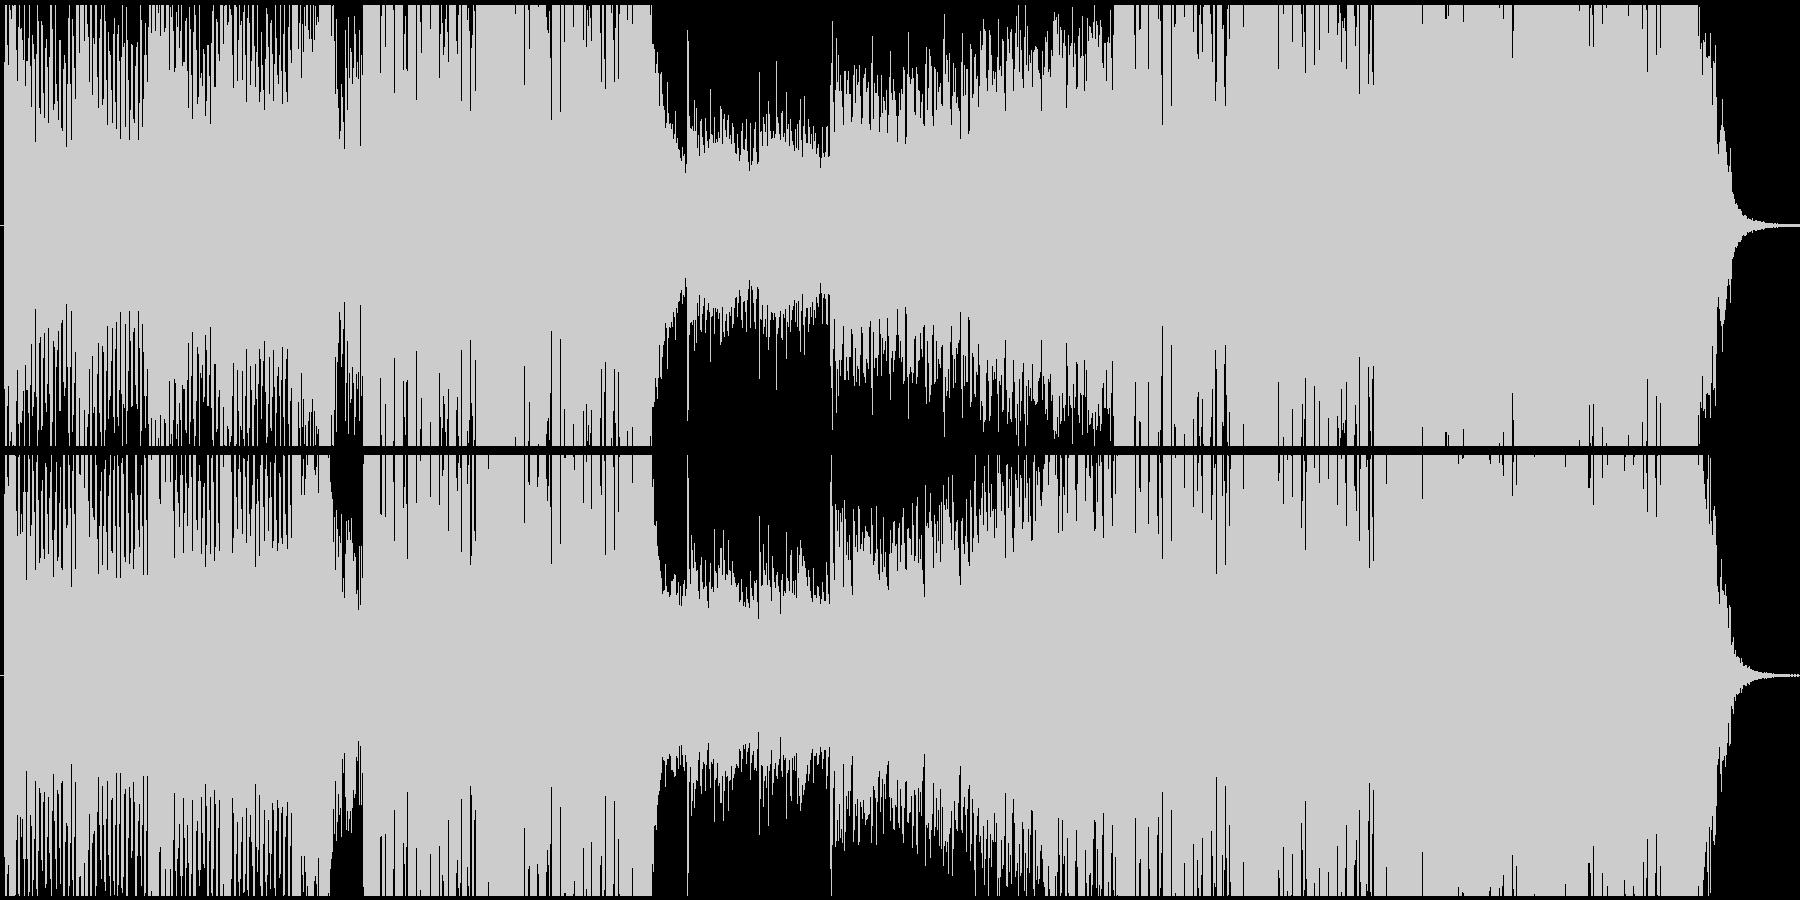 Djent+オーケストラの壮大な戦闘曲の未再生の波形